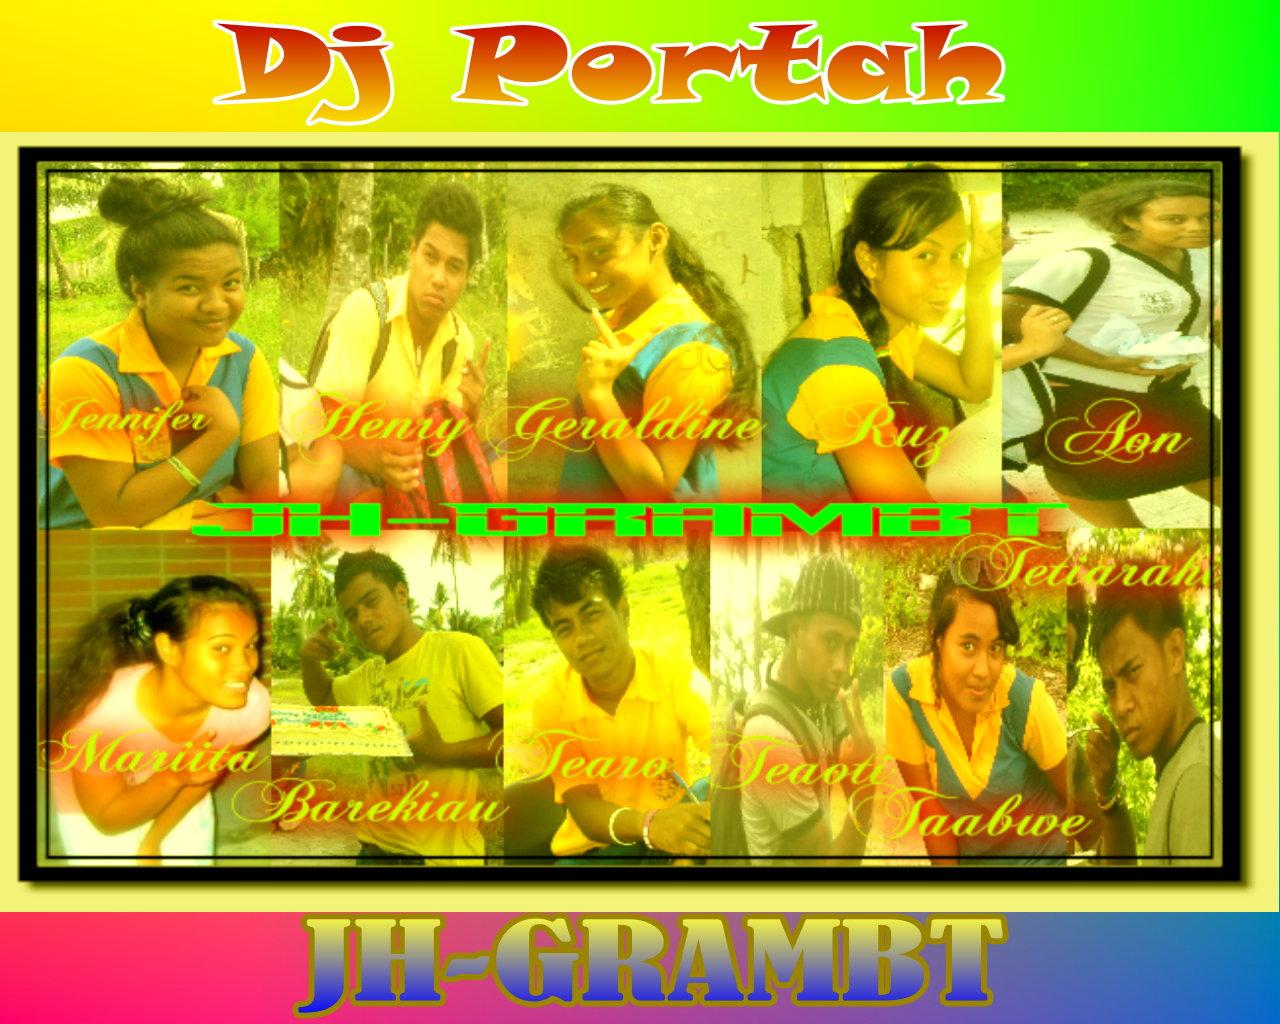 don omar danza kuduro mp3 free download songslover